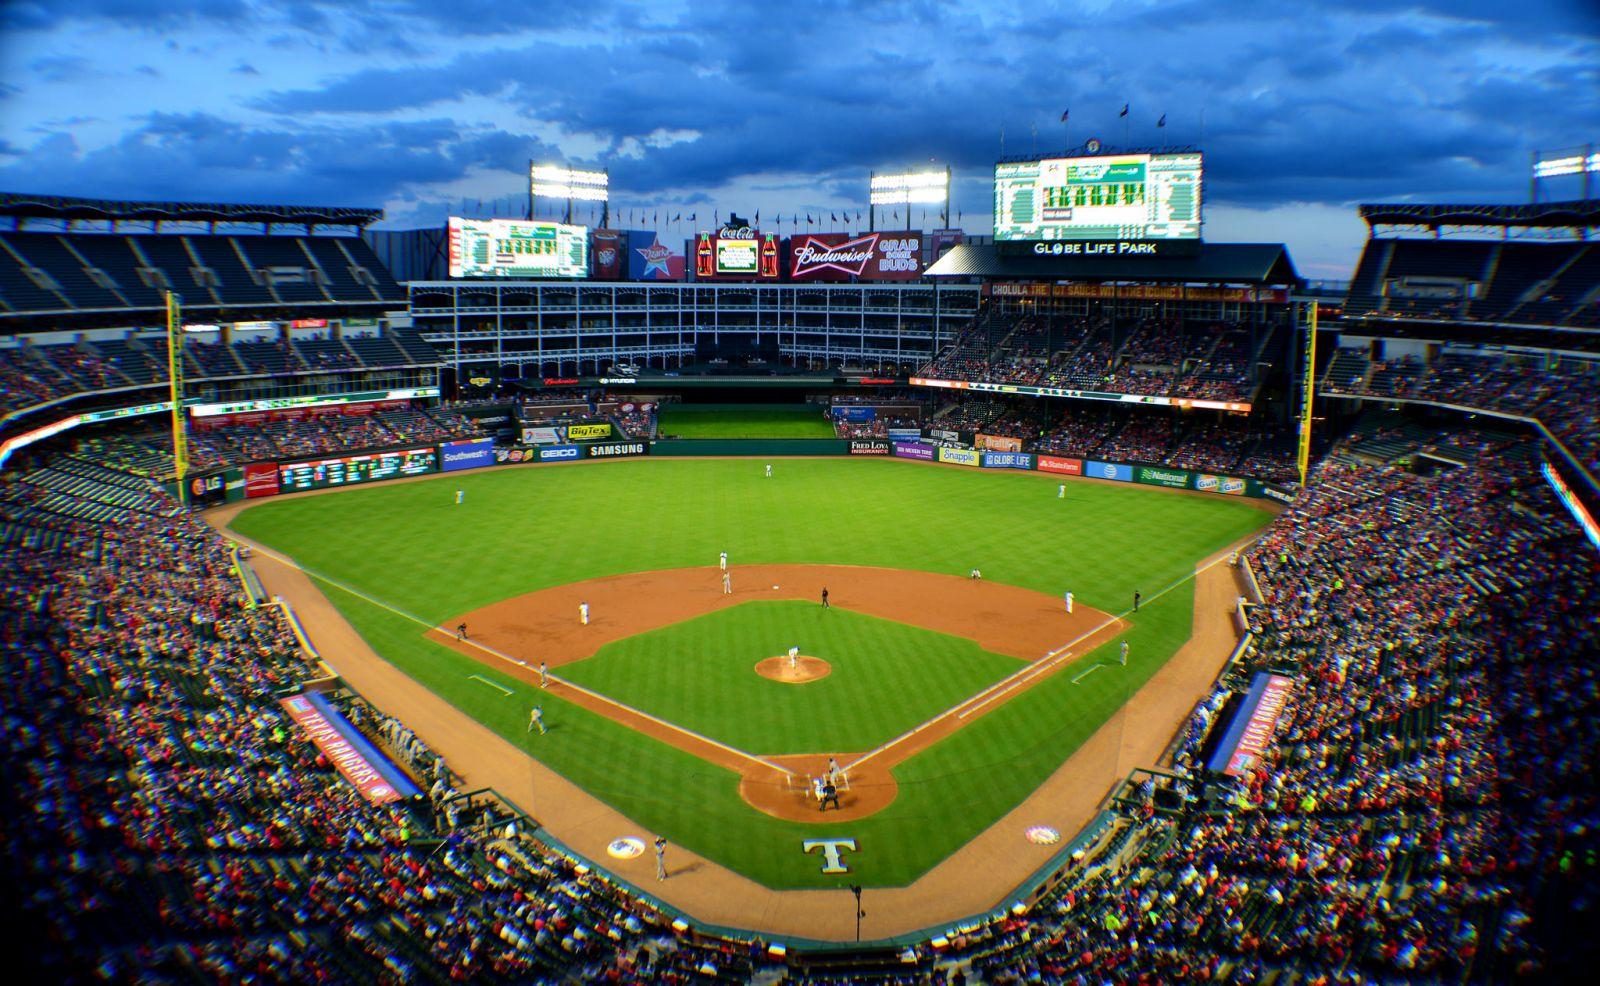 Texas Rangers Seating Chart   Rangers Seat Chart View Globe Life Park. - Texas Rangers Seat Map